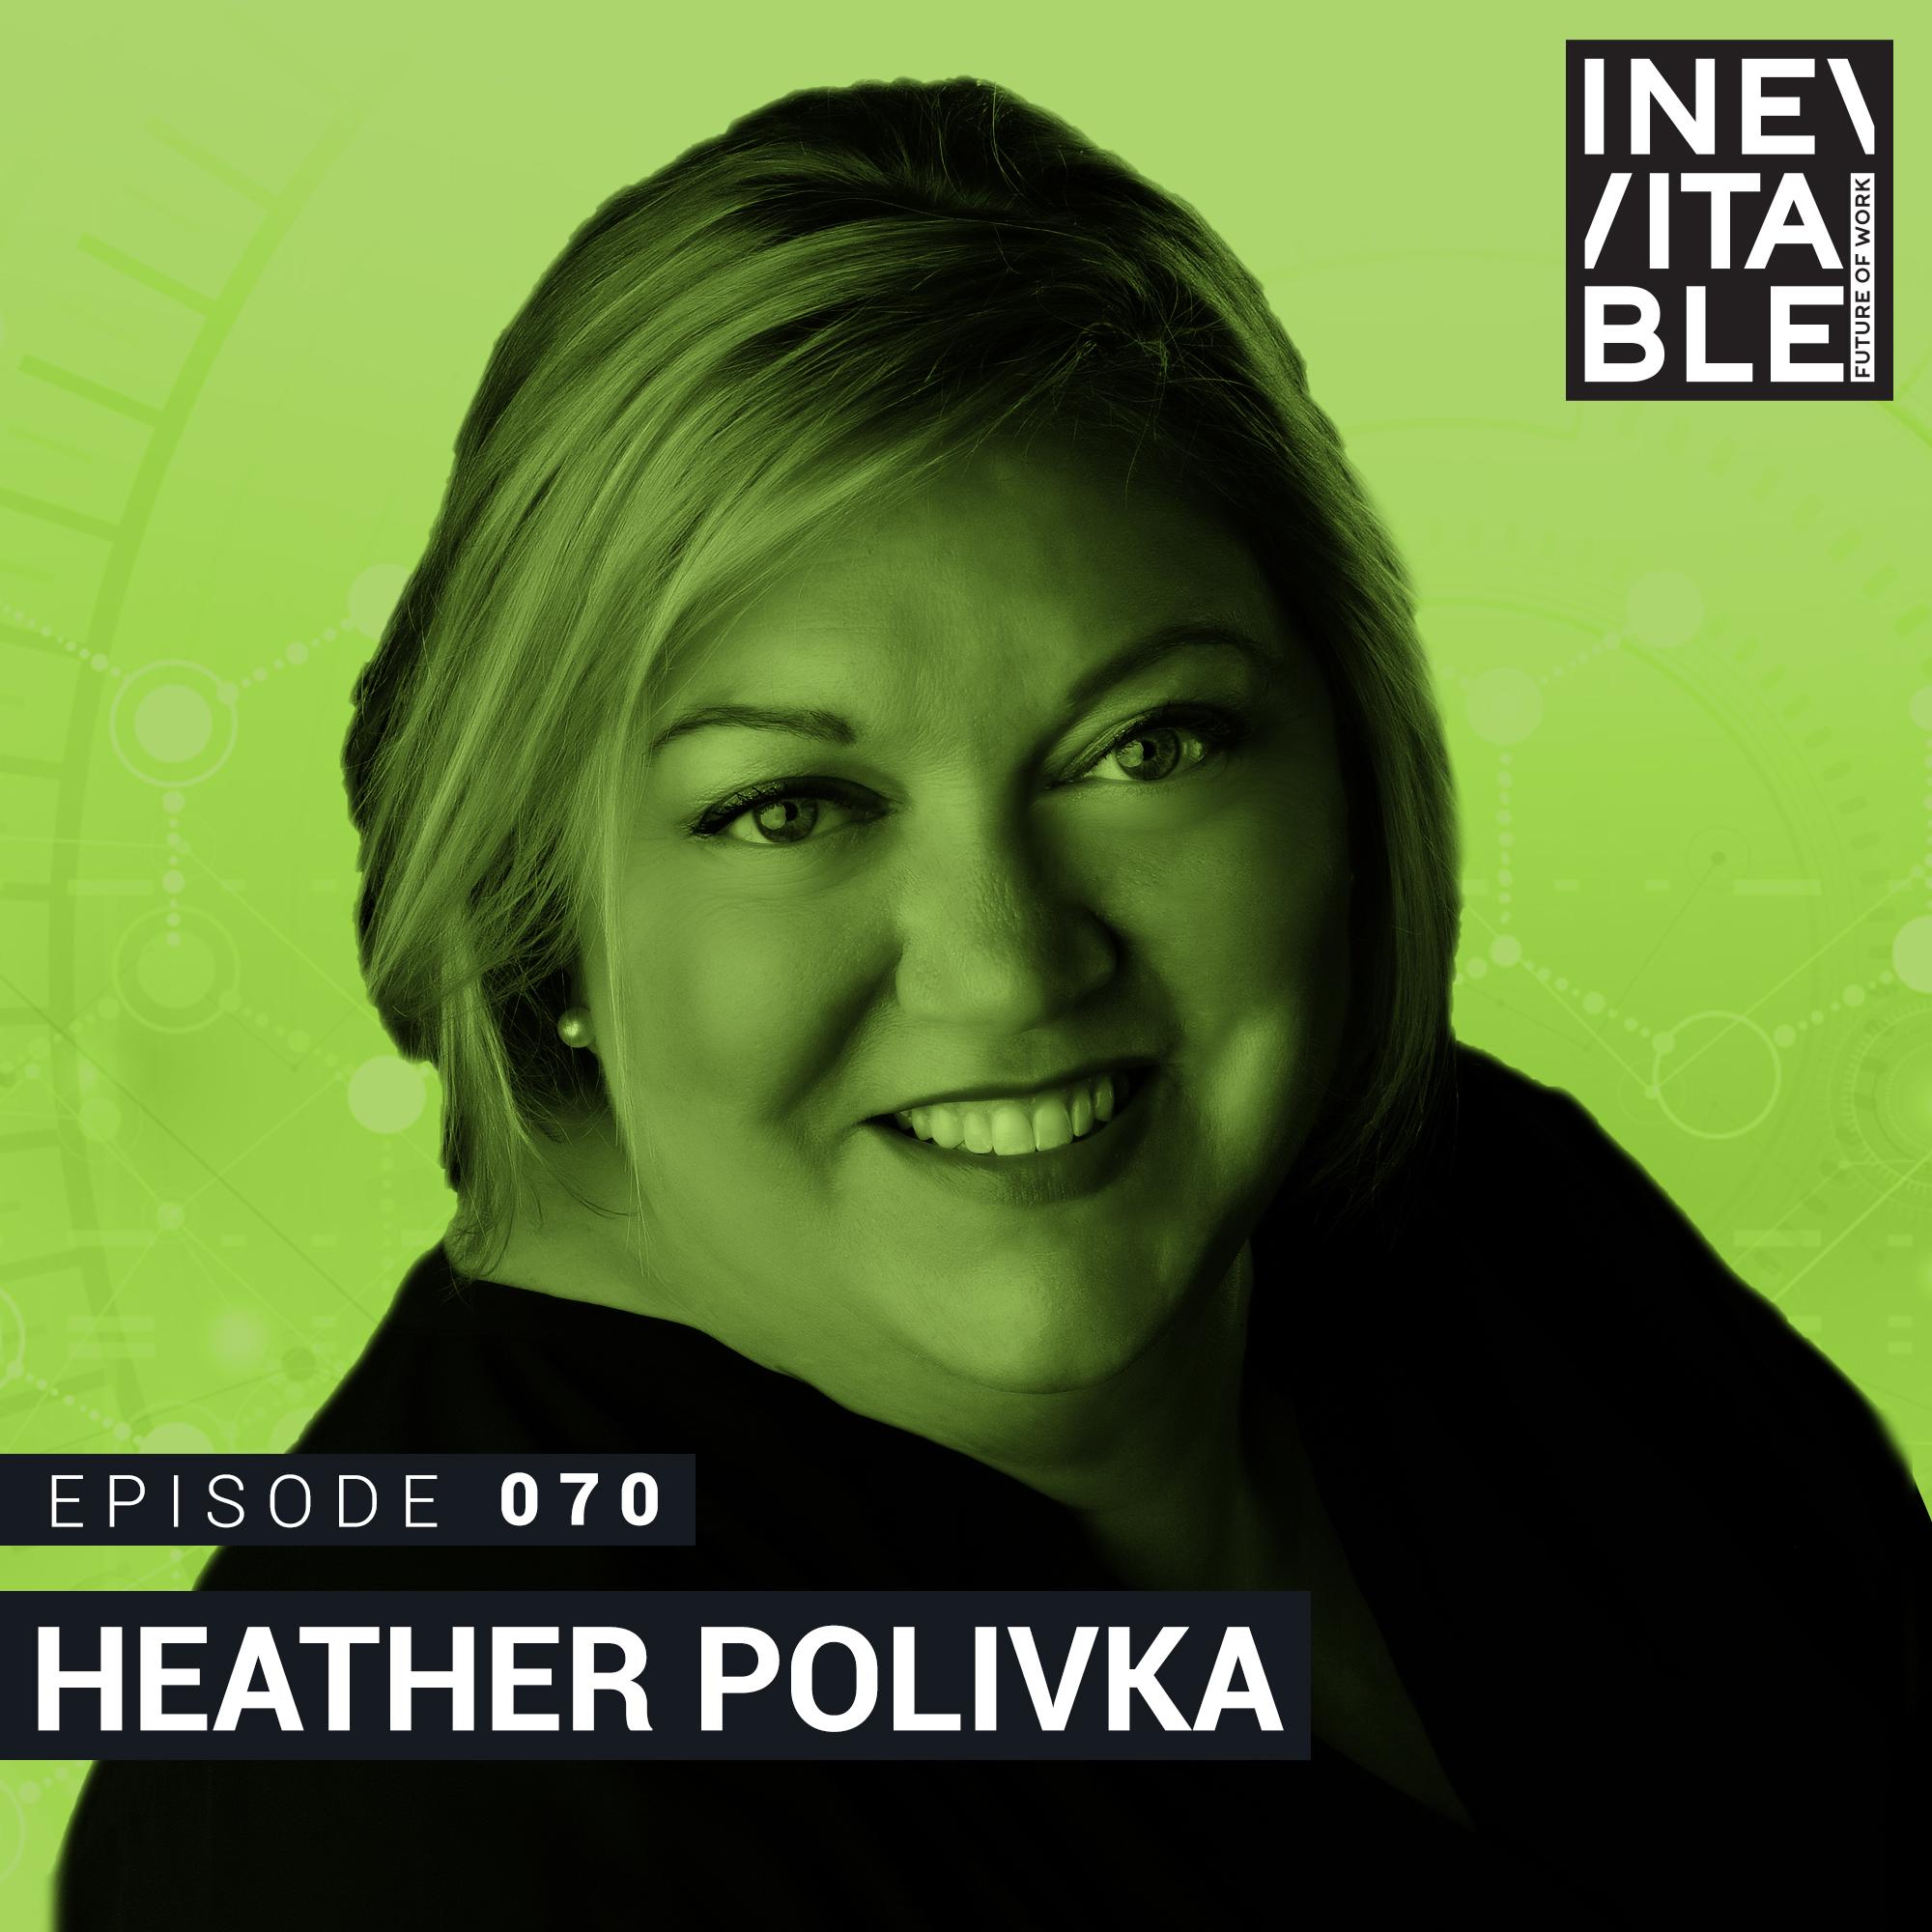 Heather Polivka